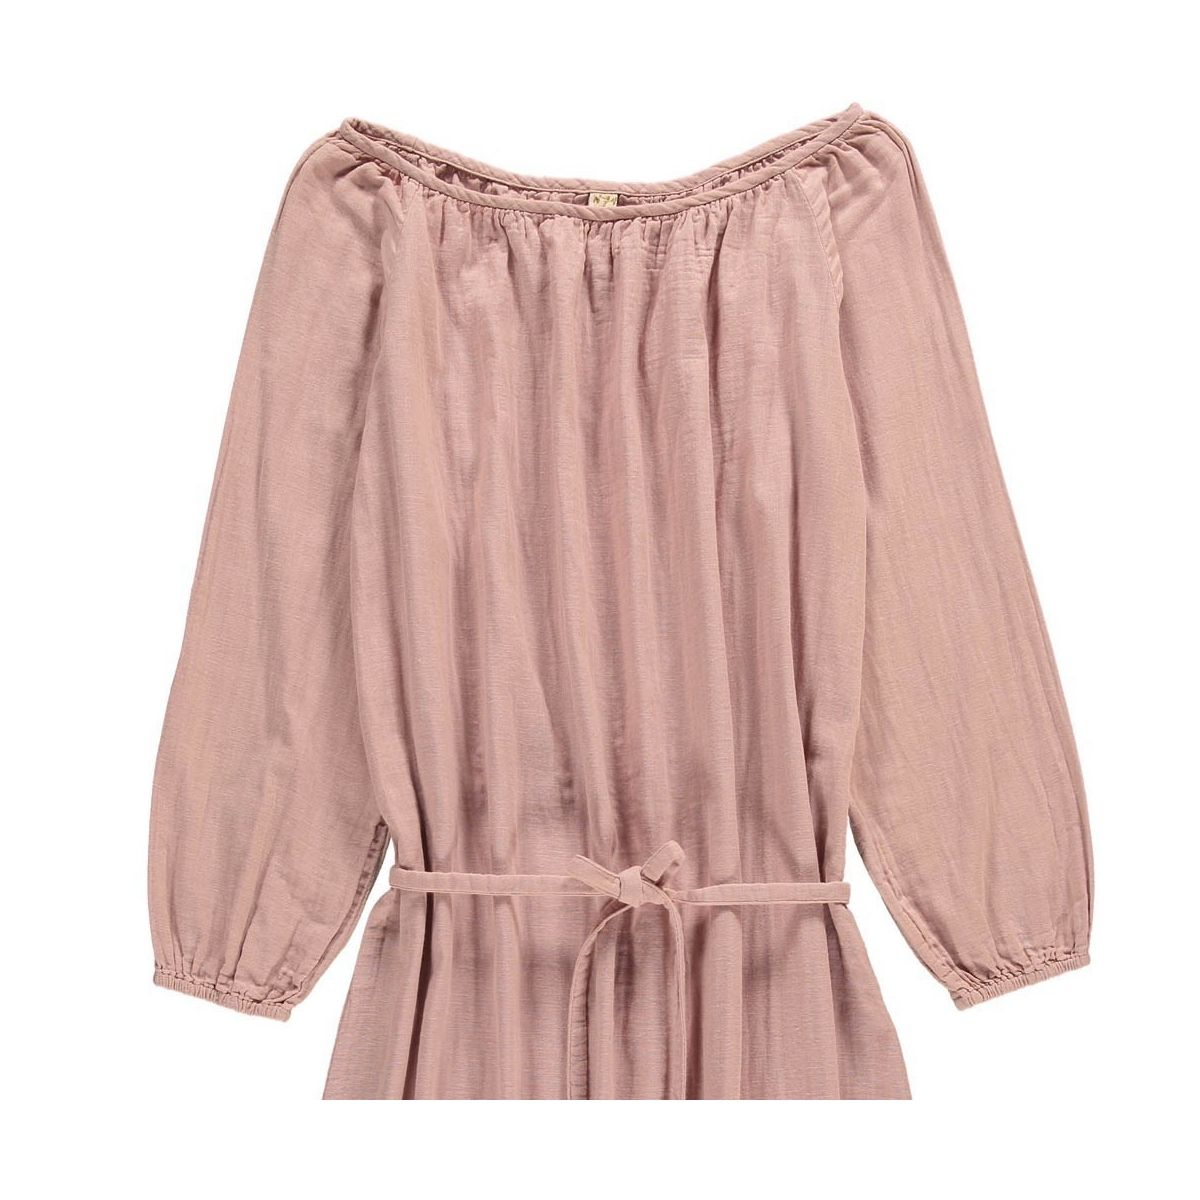 Dress for mum Nina long dusty pink - Numero 74